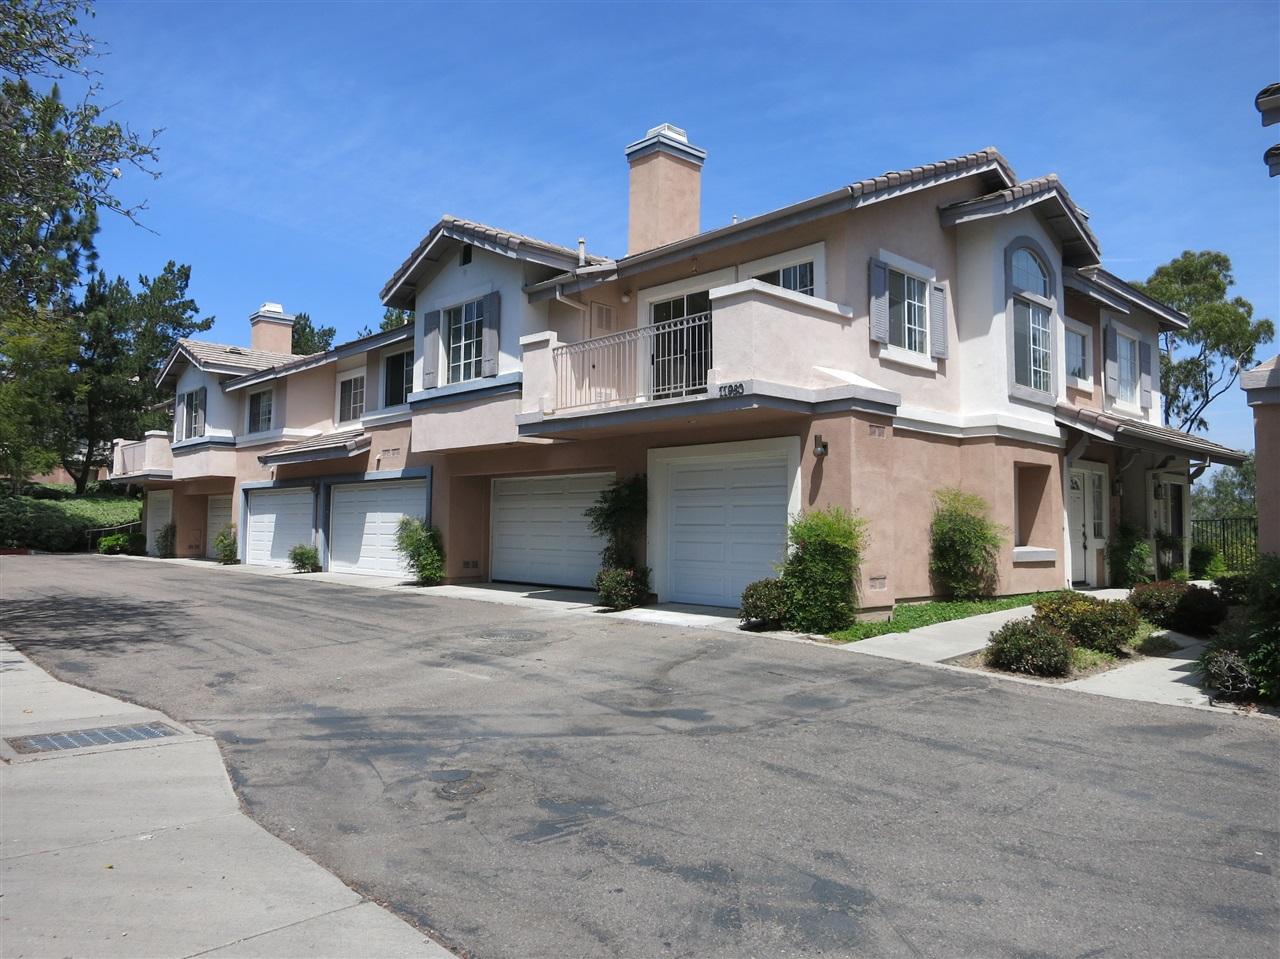 11980 Tivoli Park Row # 1, San Diego, CA